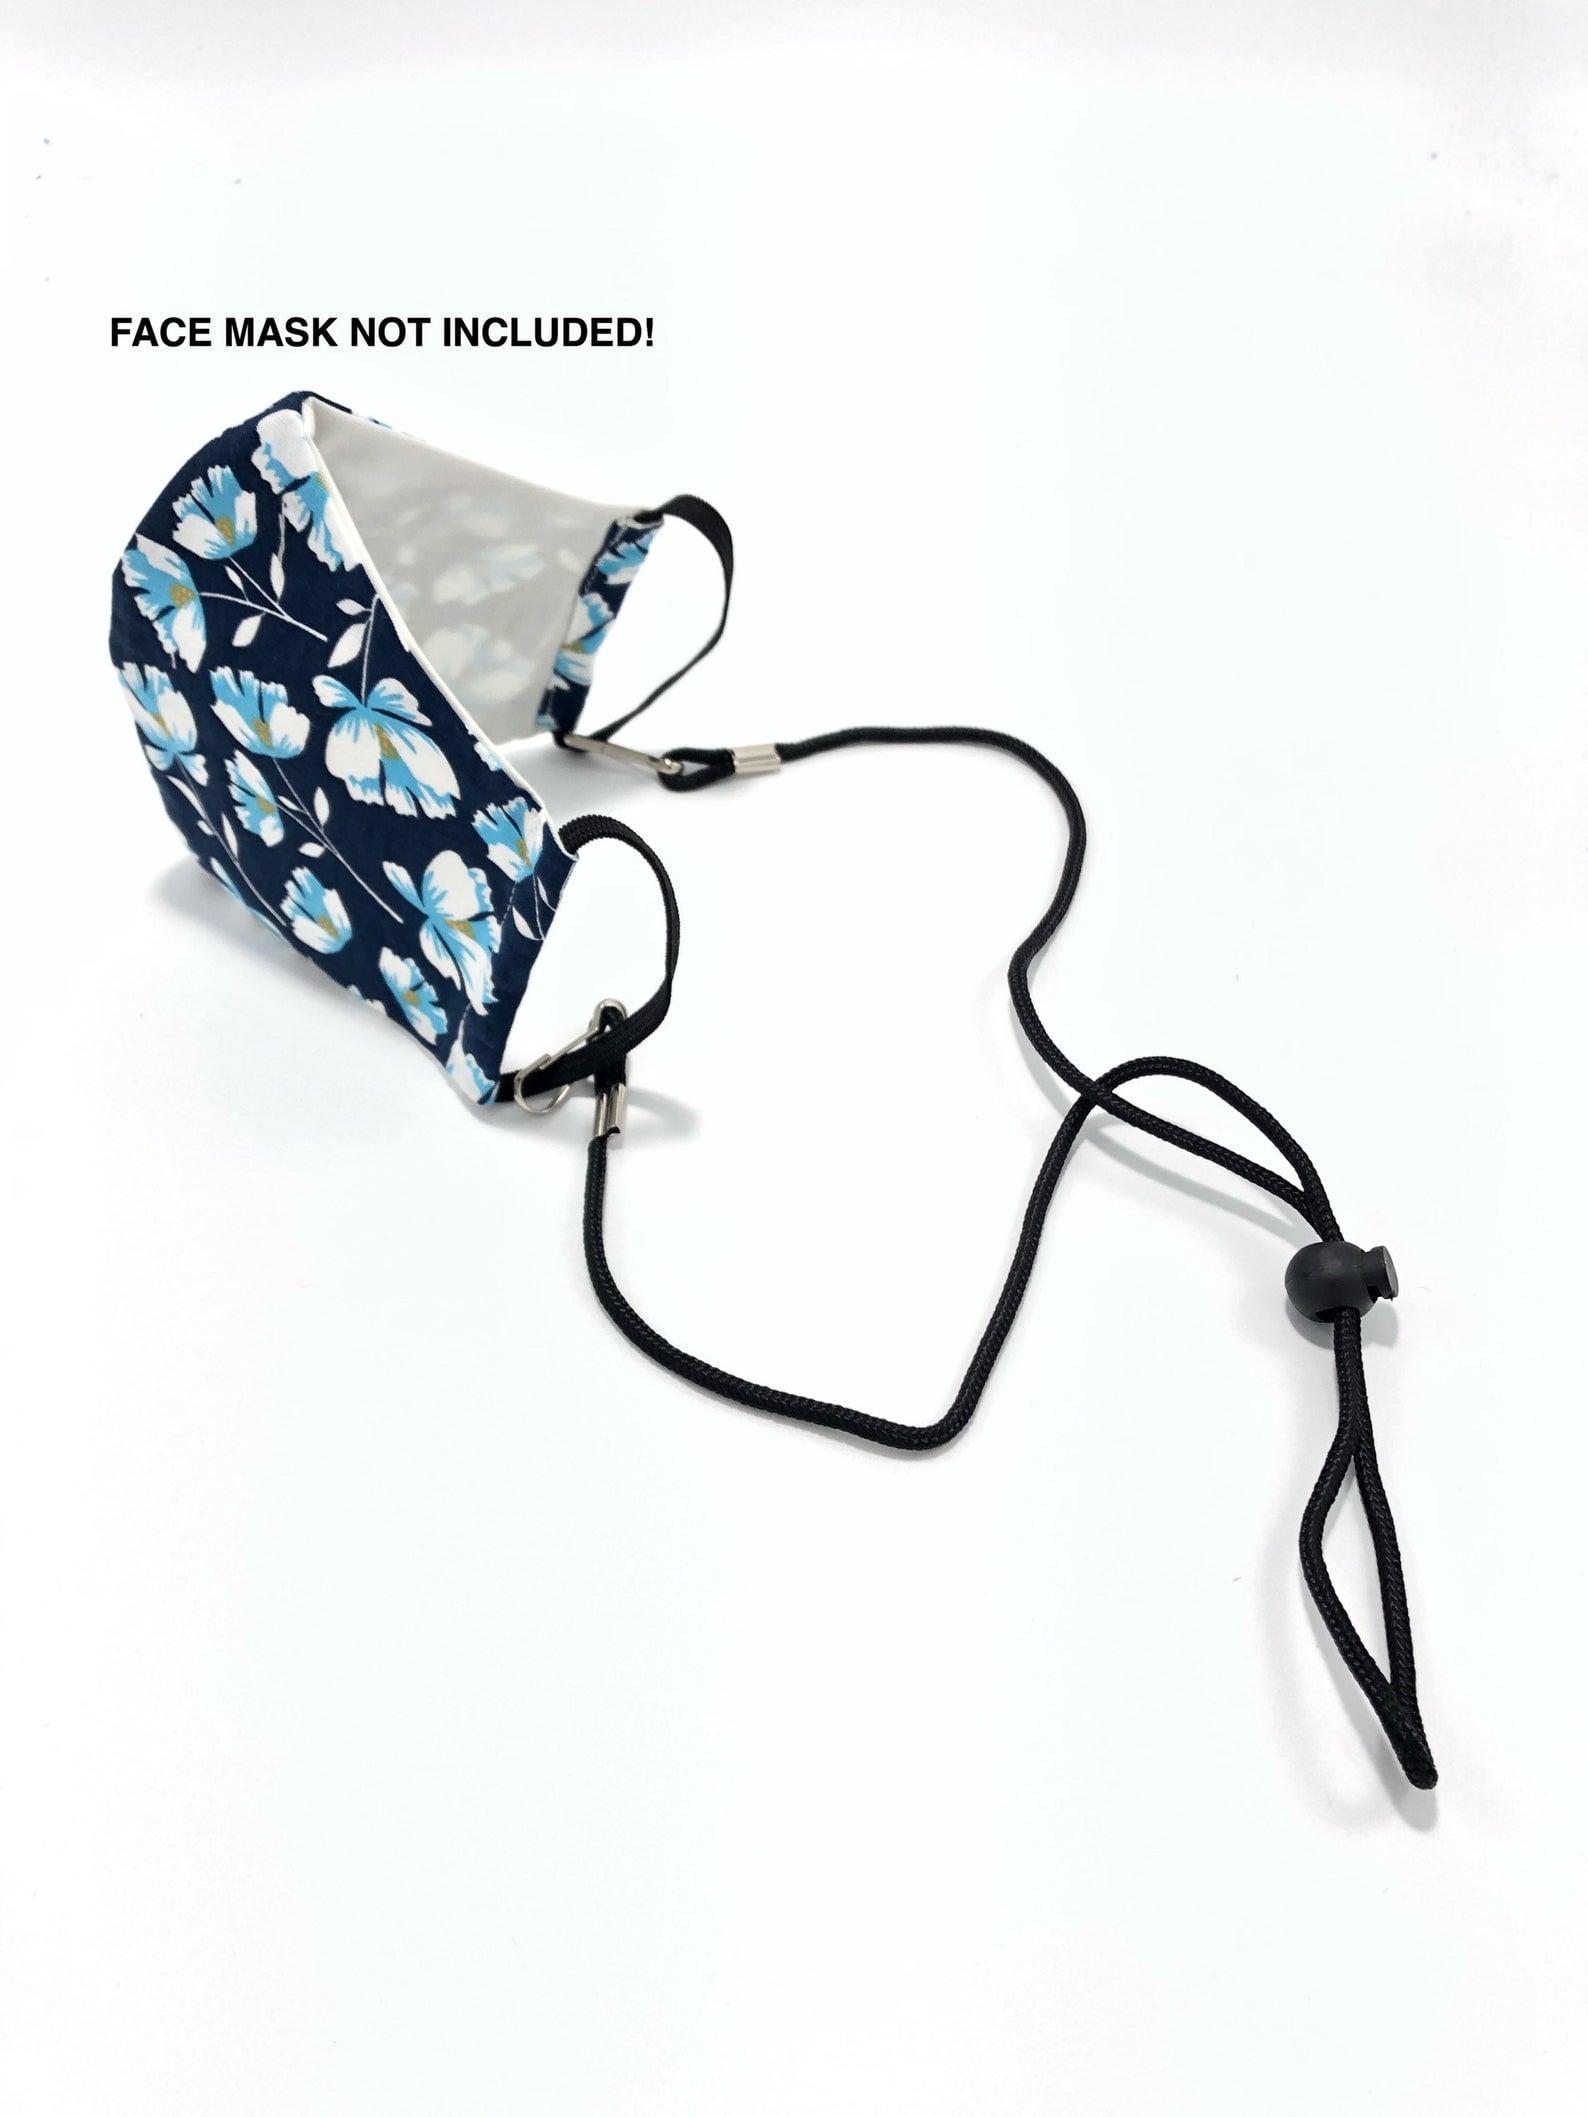 face mask chain face mask holder face mask necklace toddler face mask lanyard, Face Mask Lanyard kids face mask holder